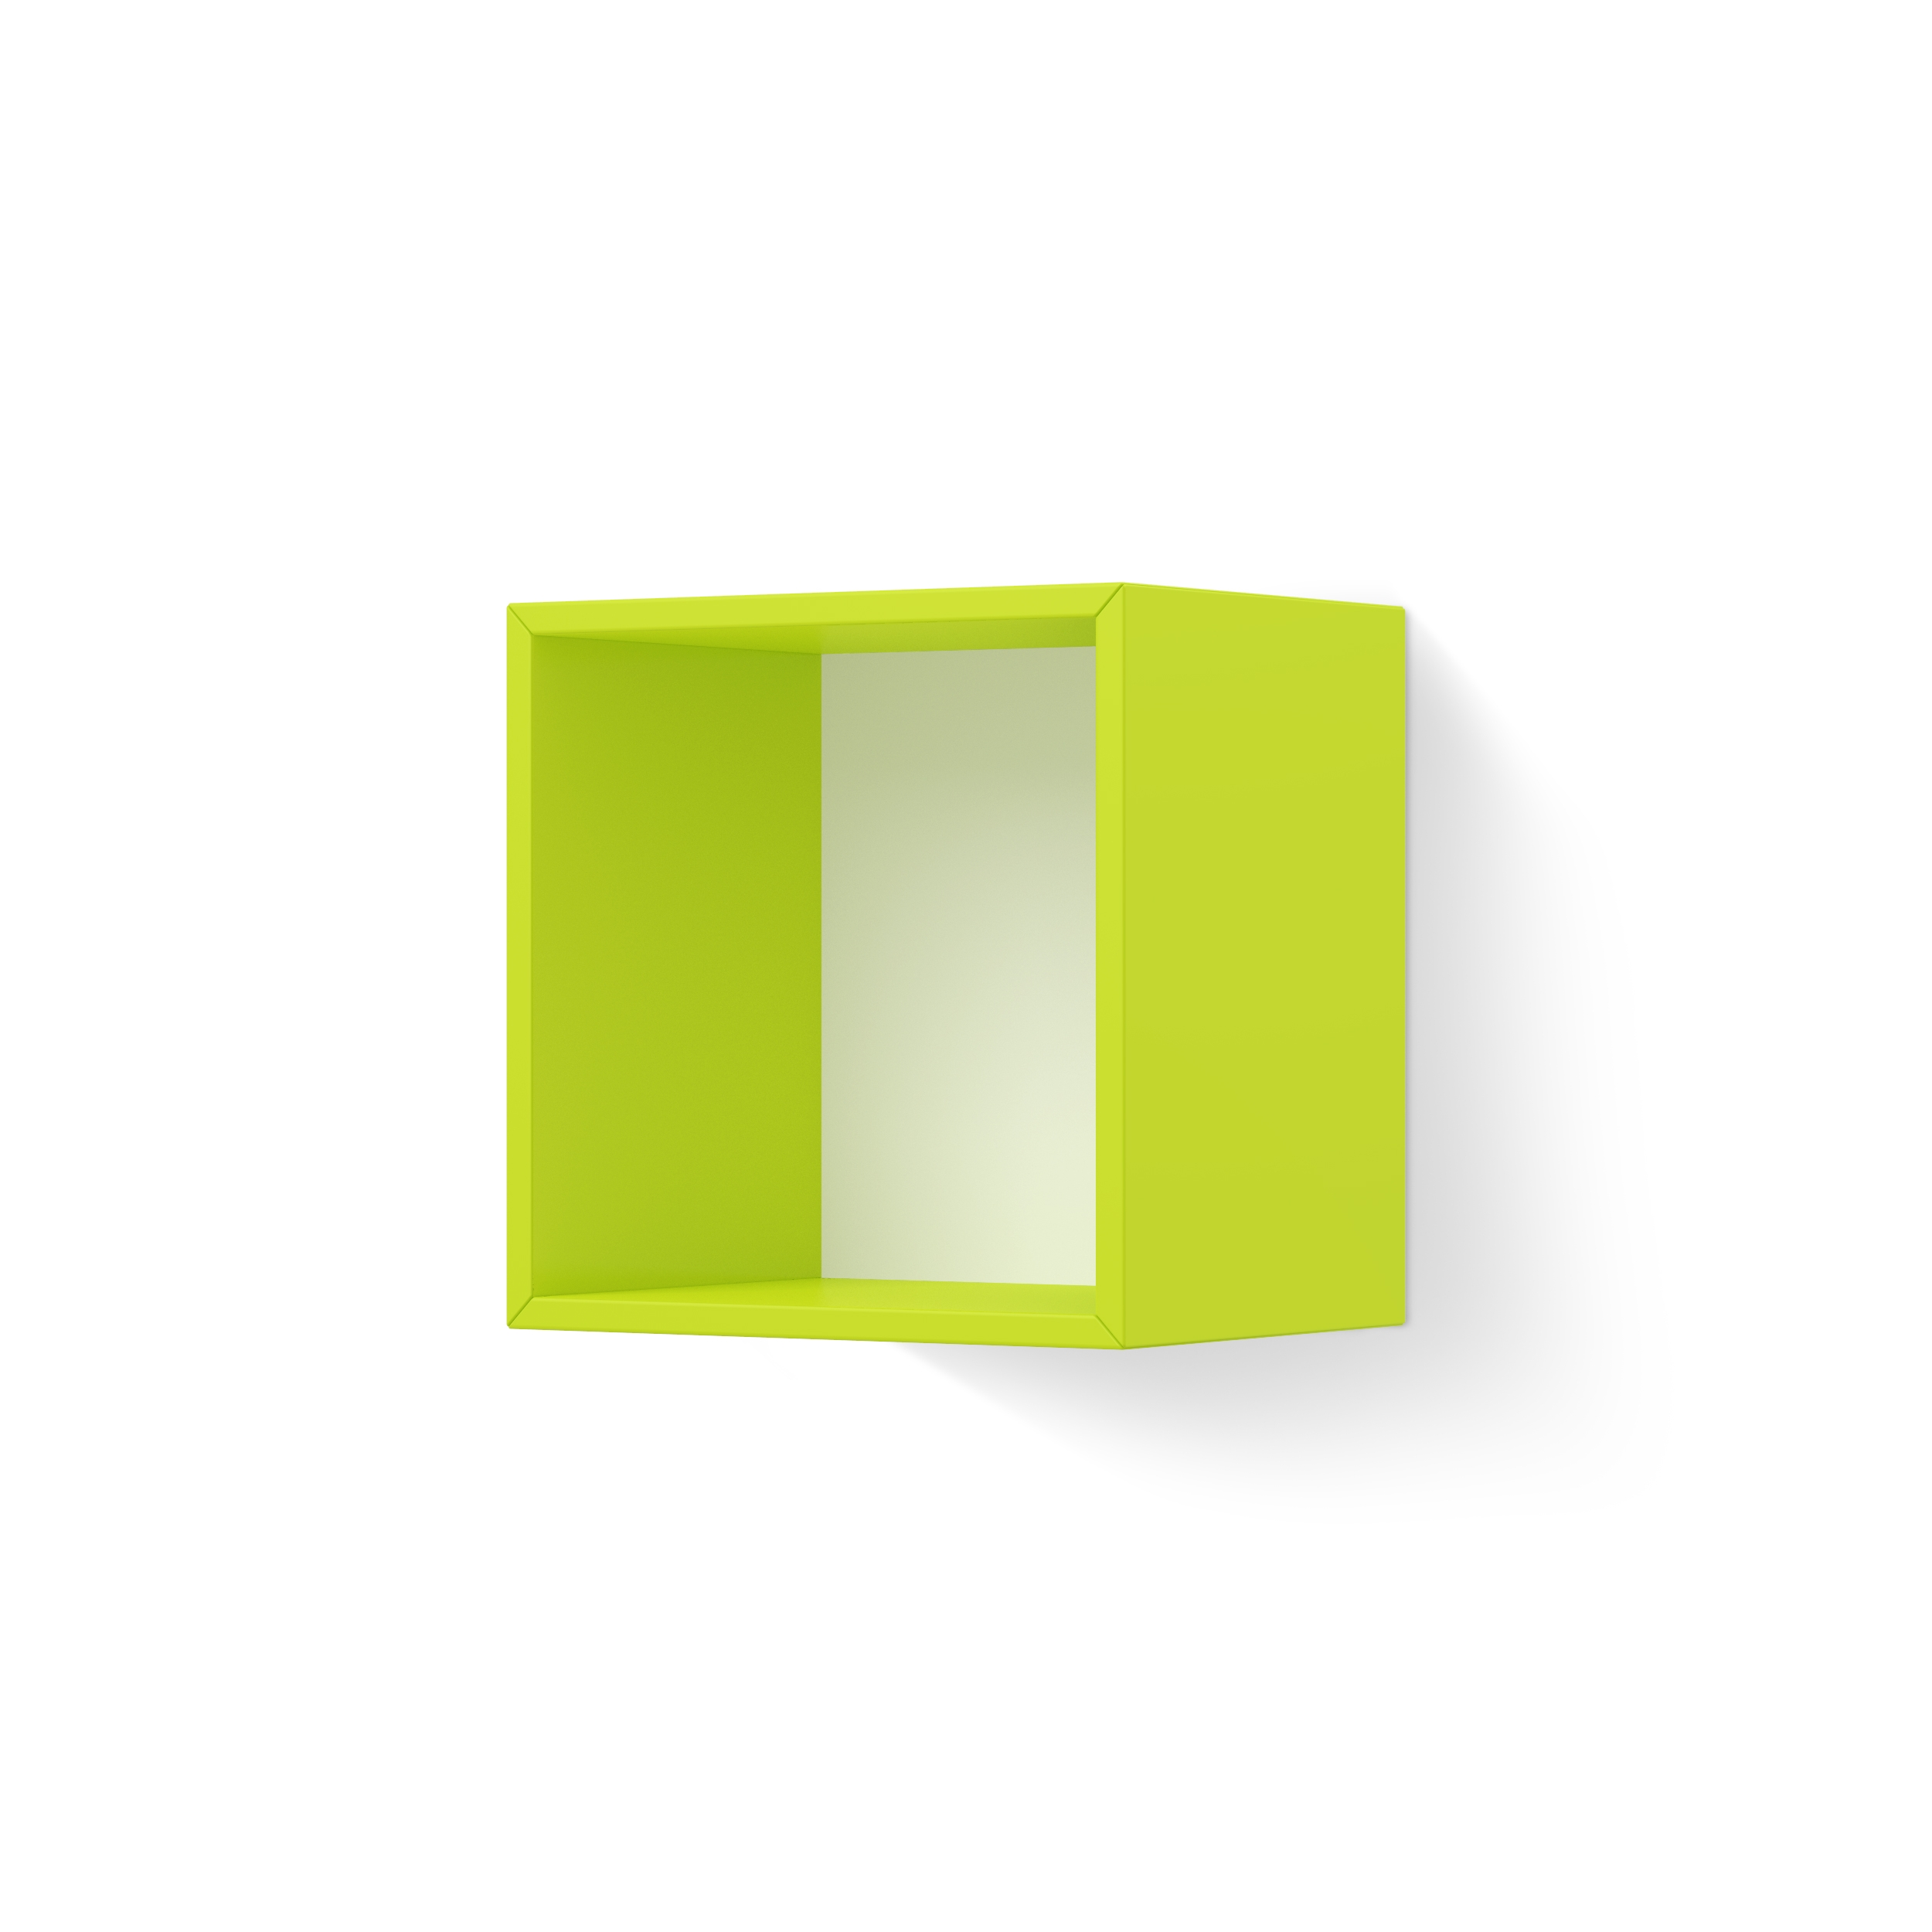 Raft Modular Mdf Verde Imagine